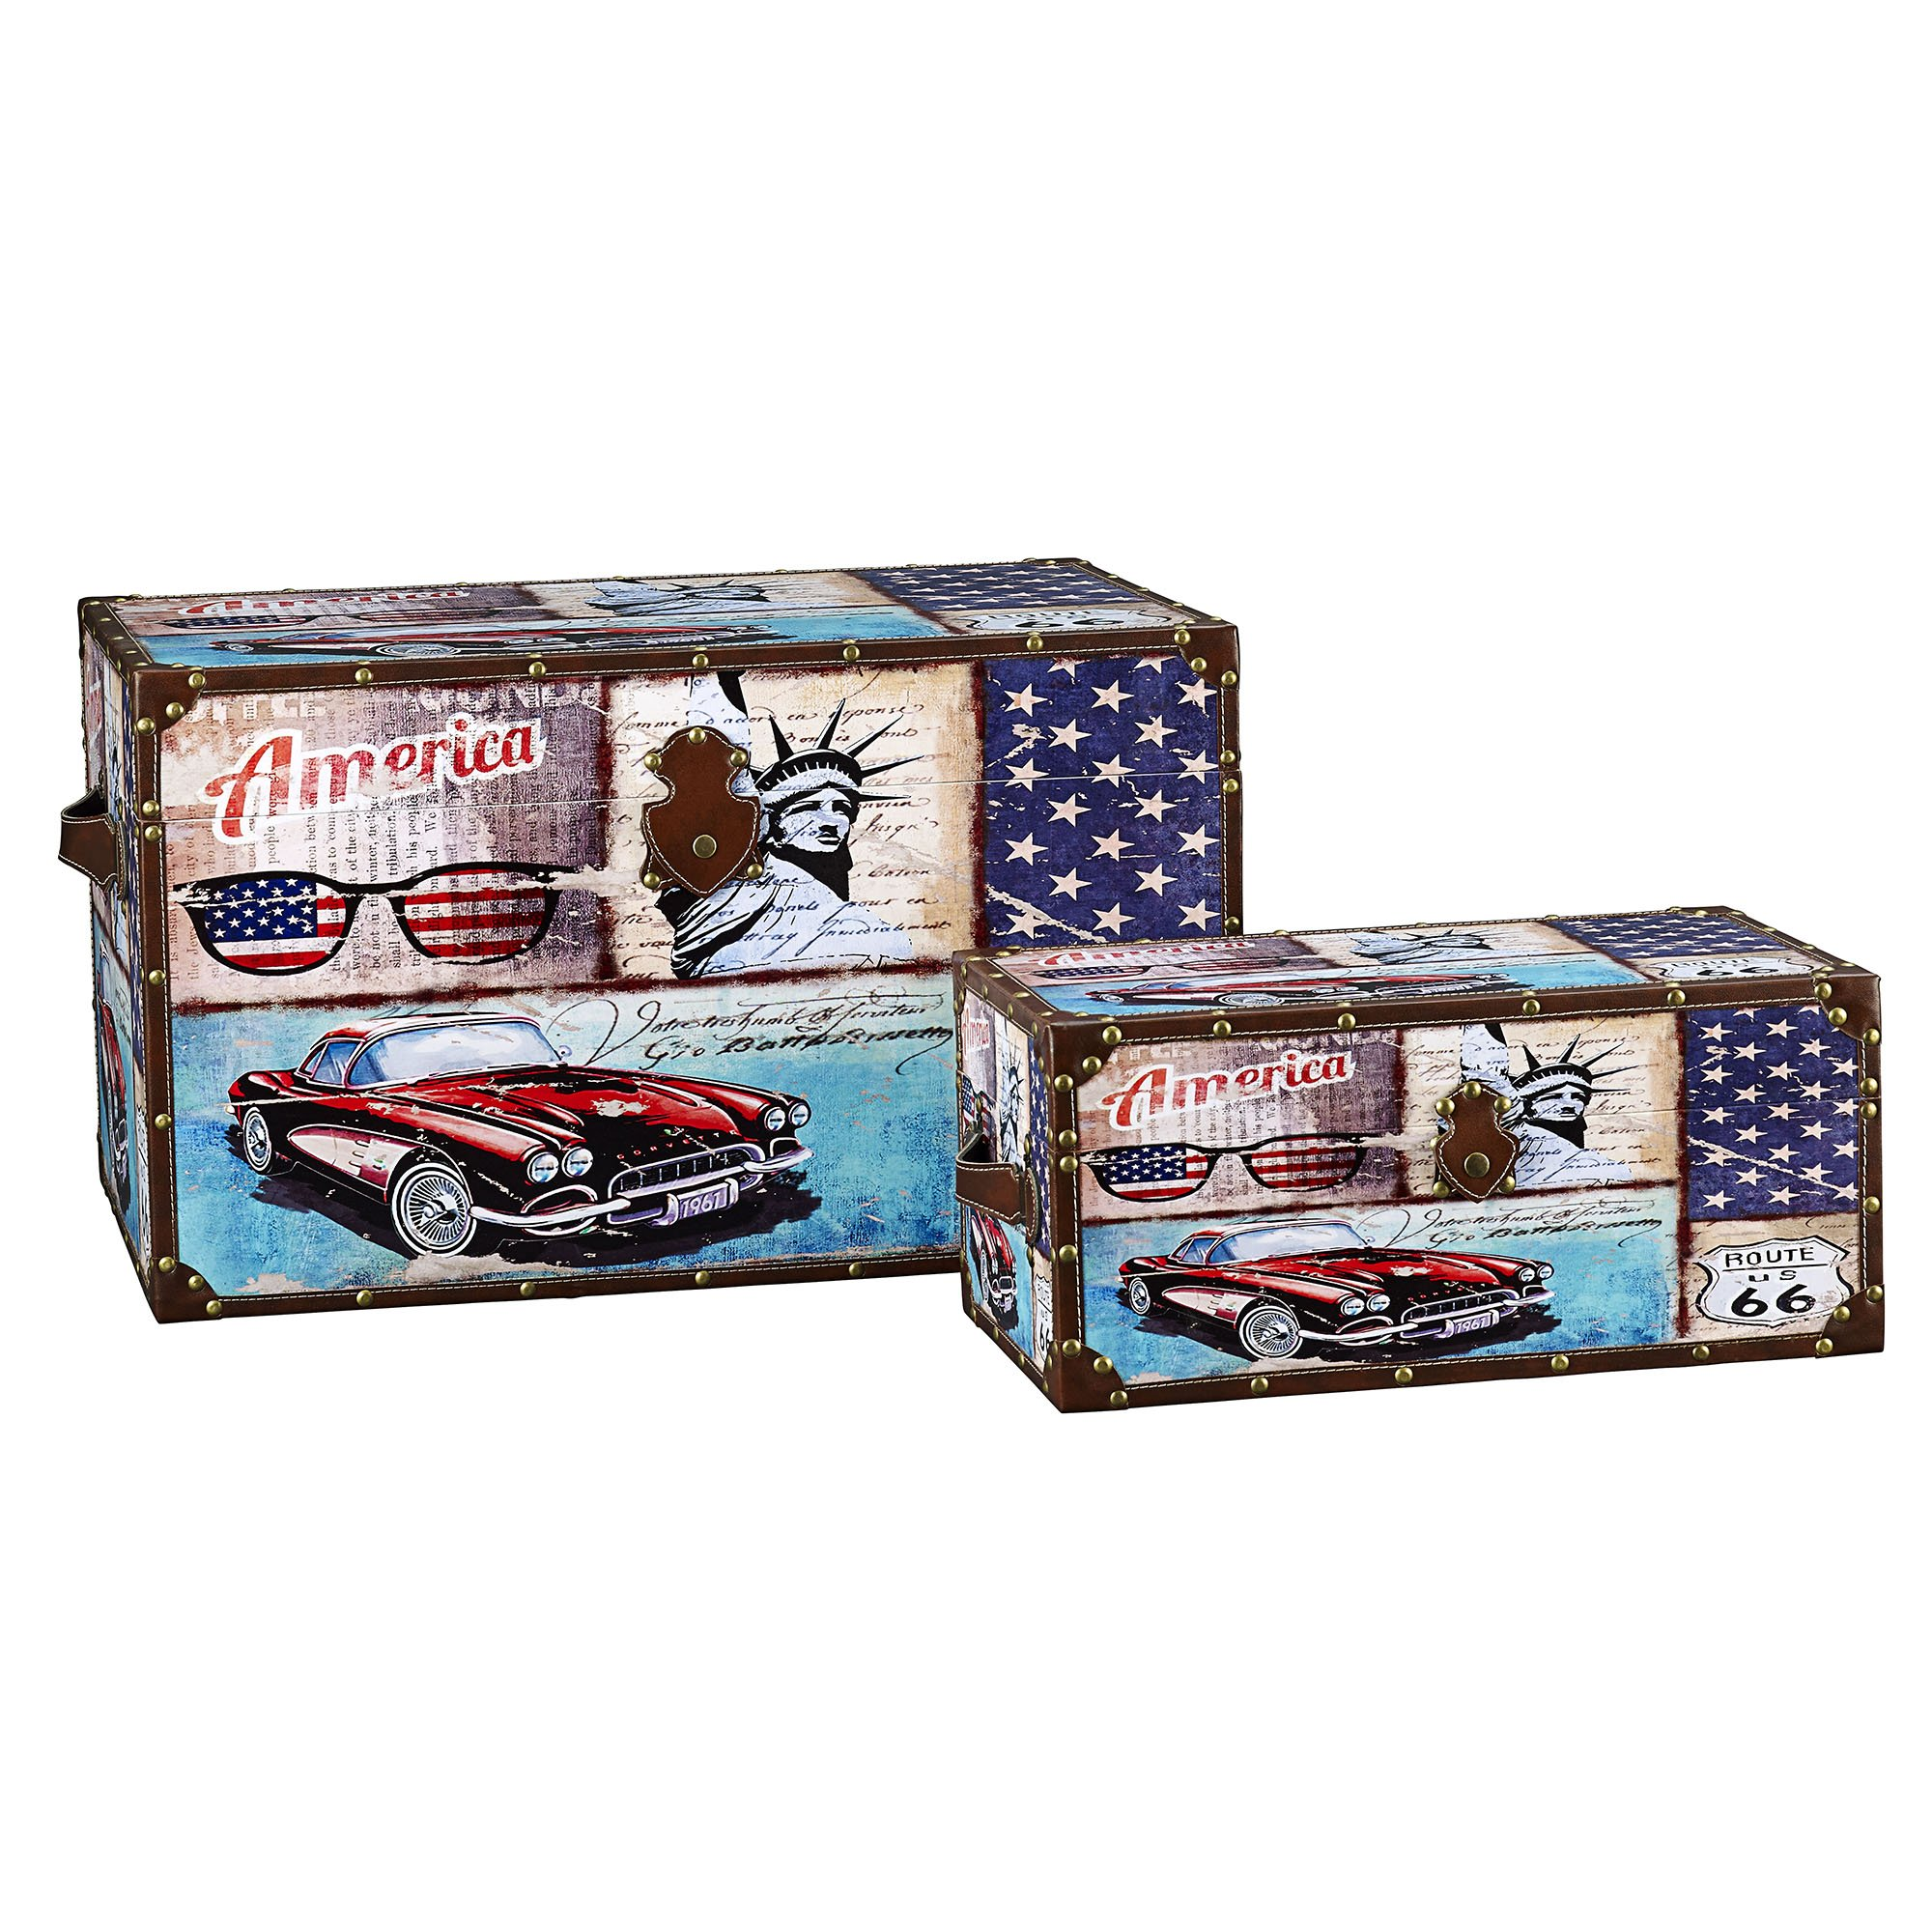 Household Essentials Decorative Storage Trunk, Classic Americana Vintage Car Design, Set of 2